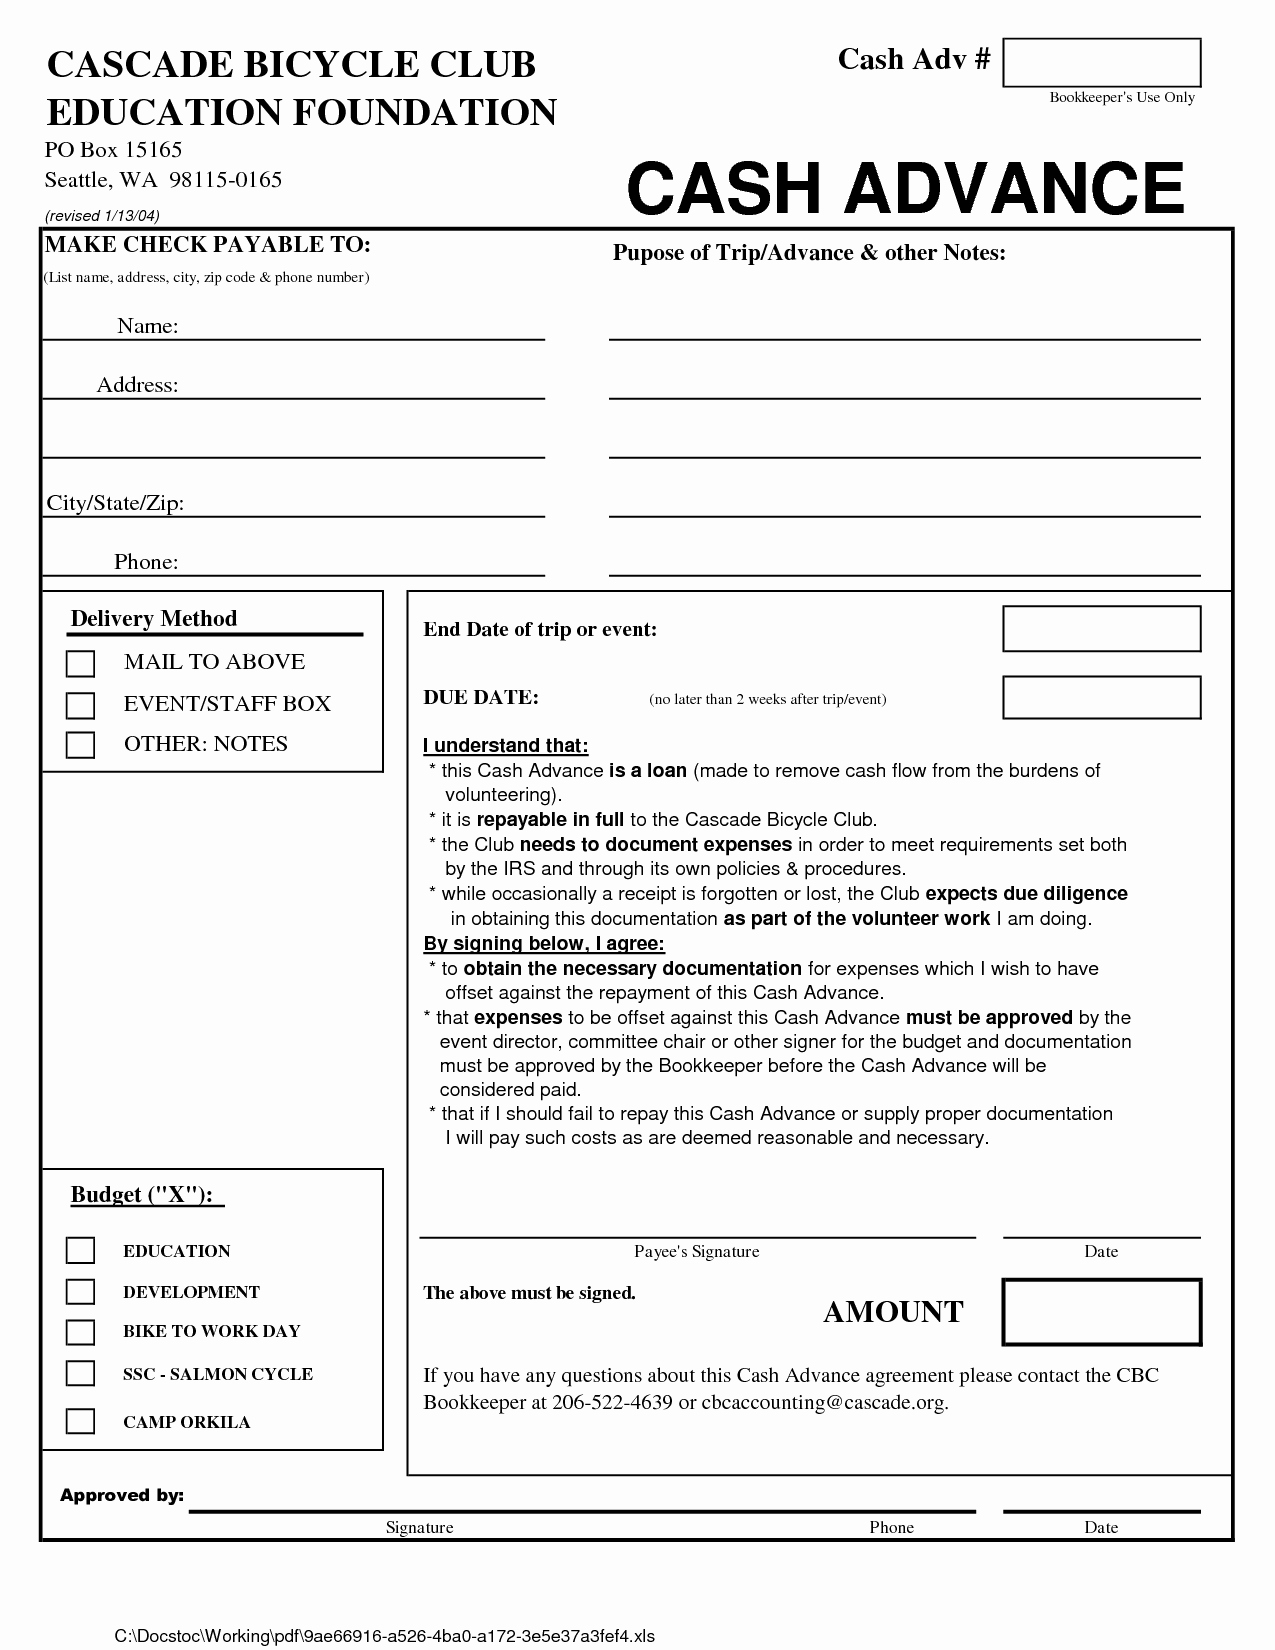 Money Loan Contract Template New Money Loan Contract Template Portablegasgrillweber